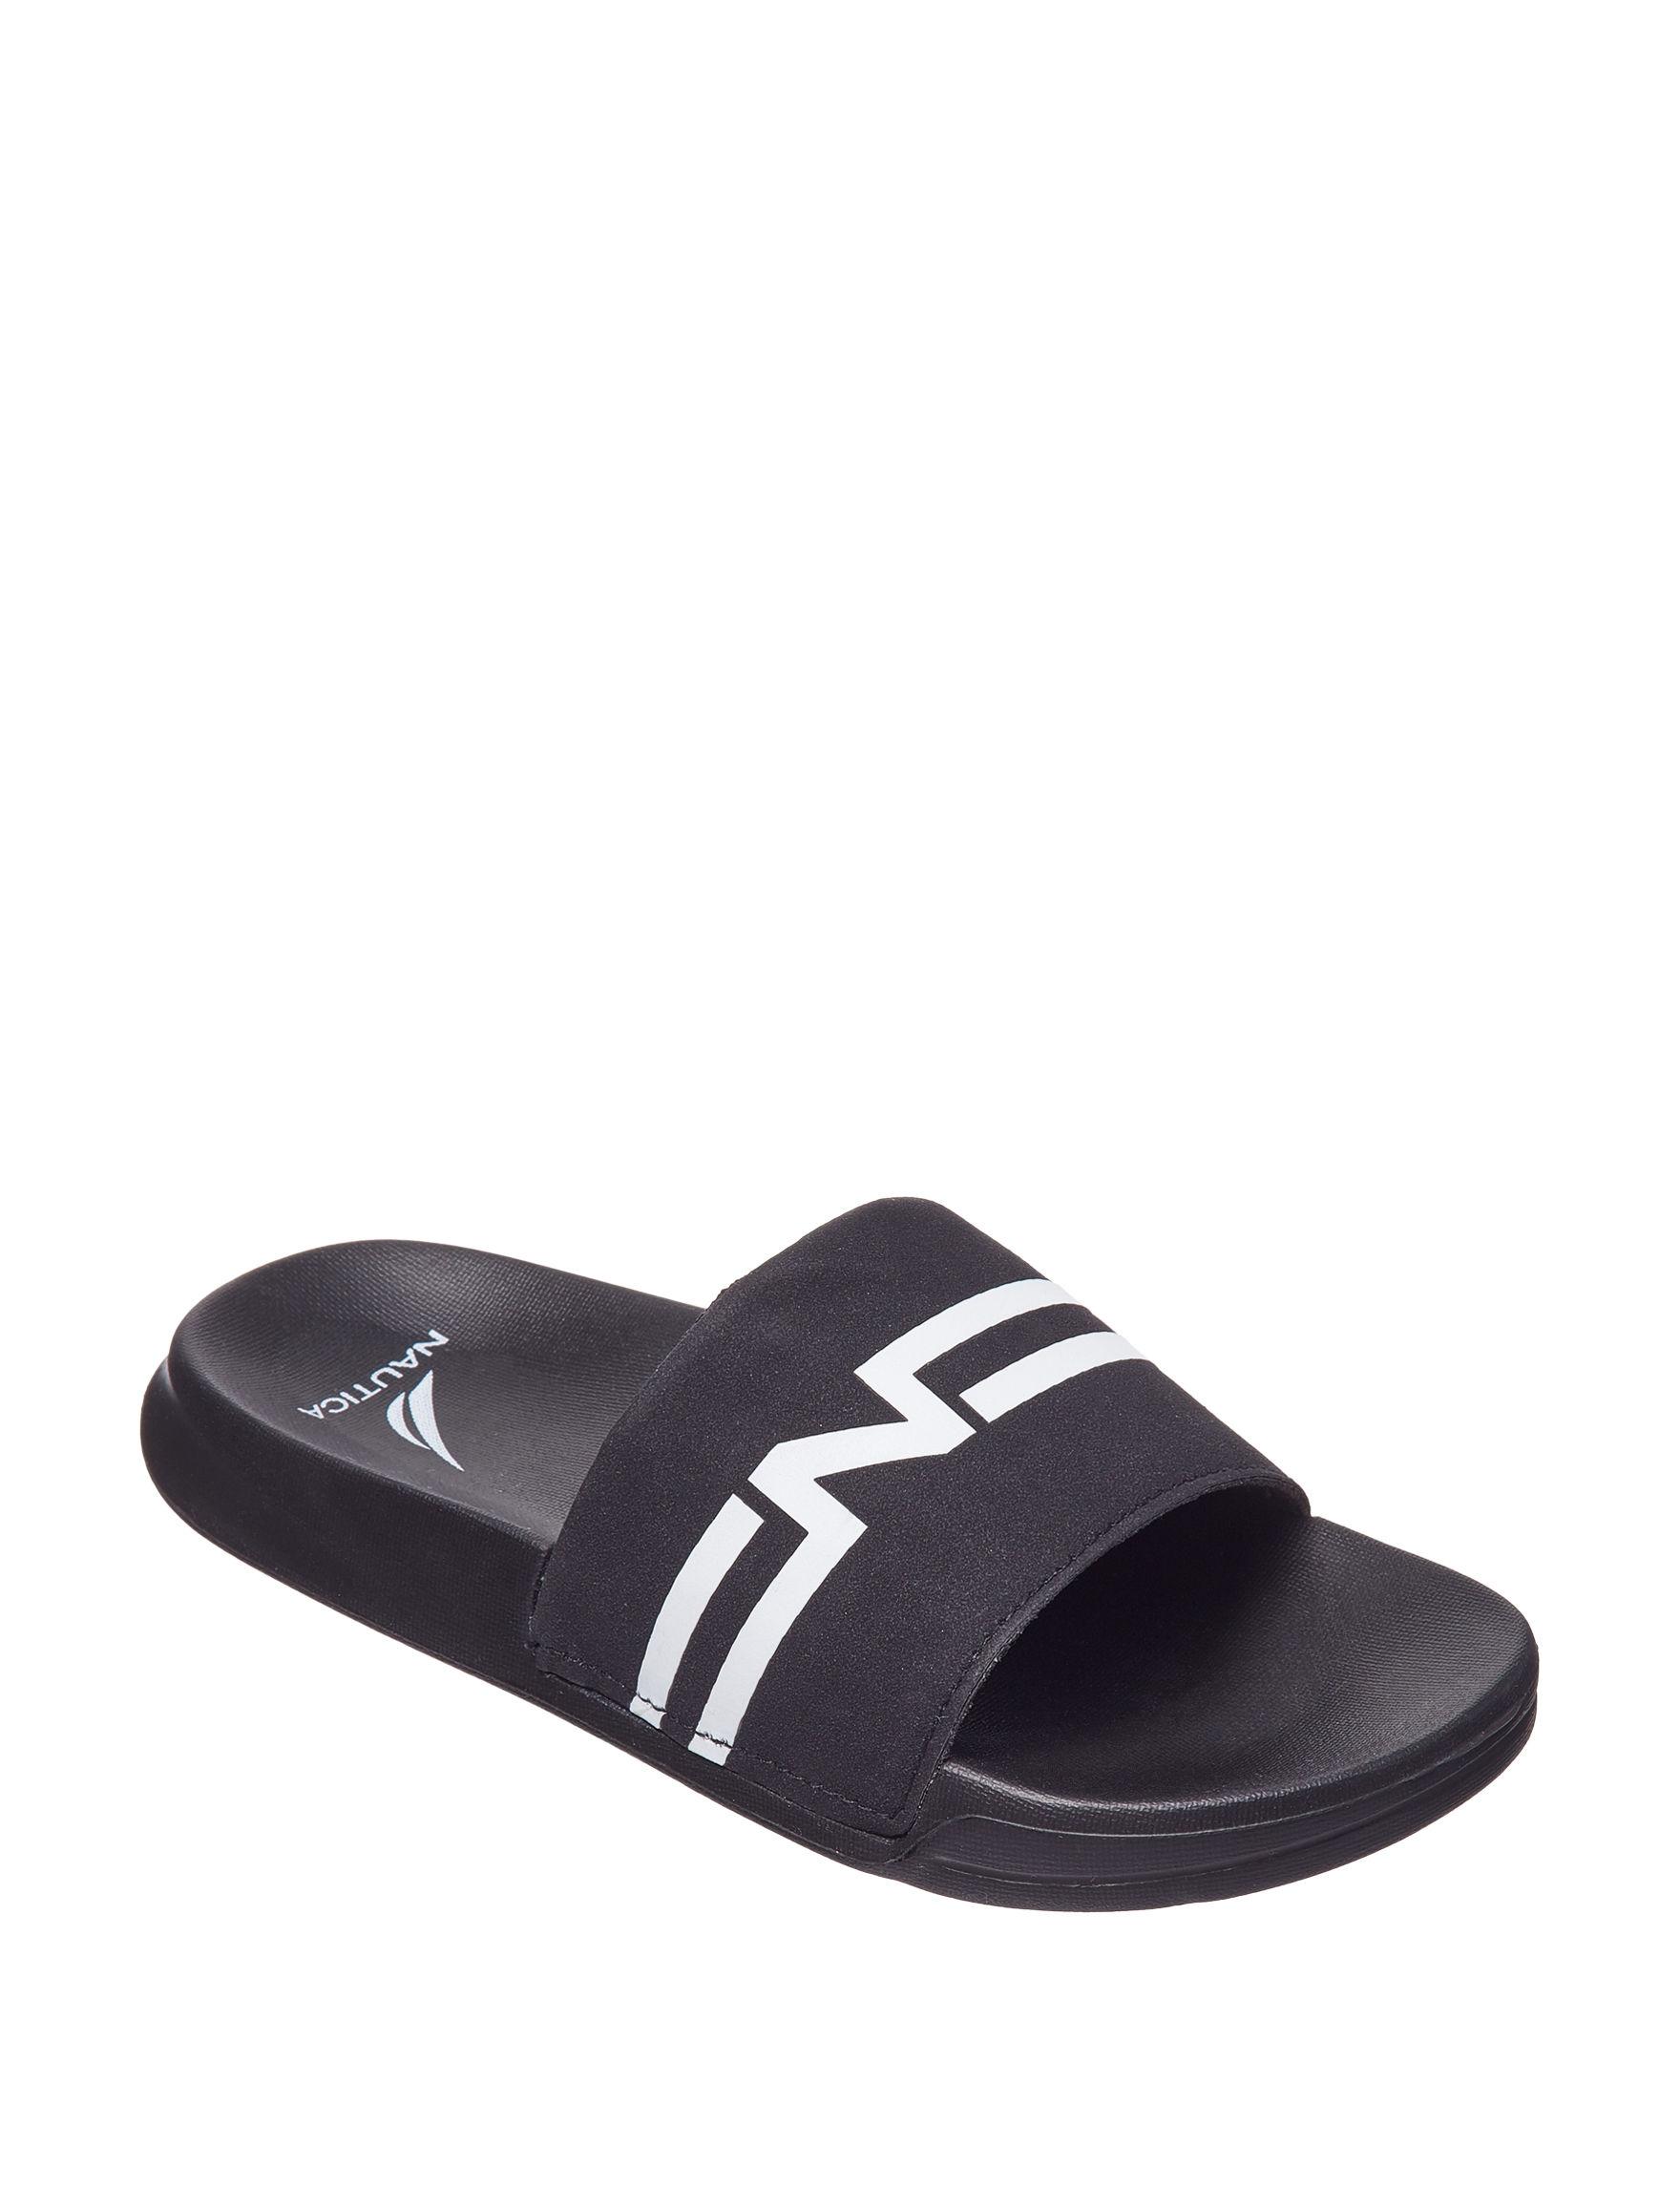 Nautica Black Flip Flops